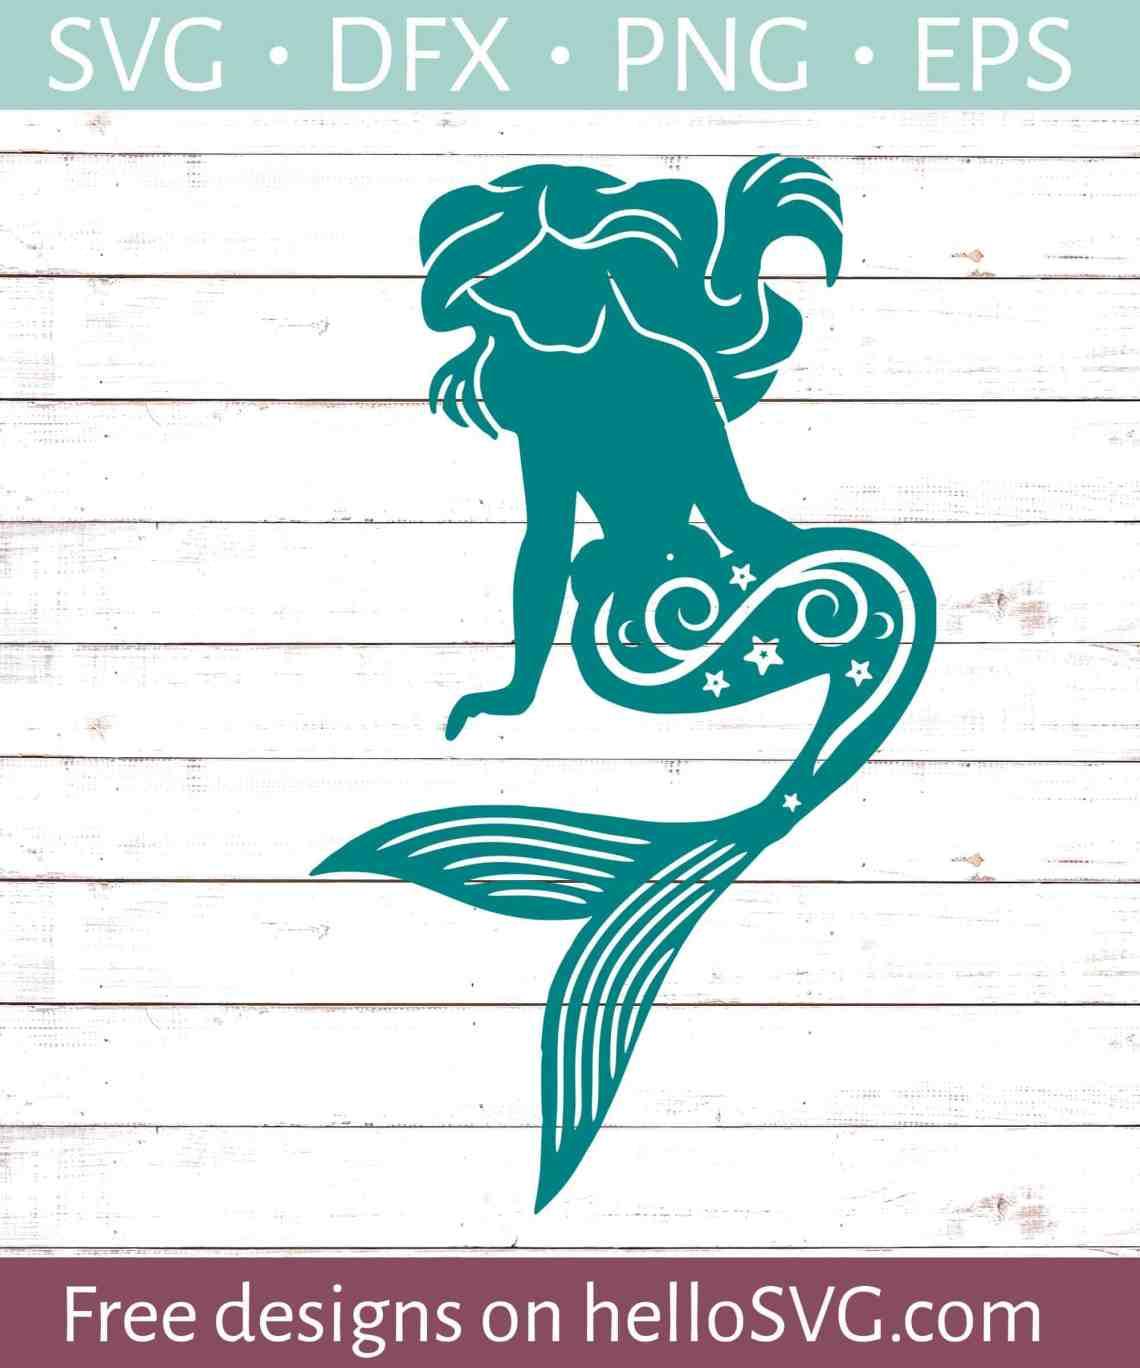 Download Mermaid Silhouette #3 SVG - Free SVG files | HelloSVG.com